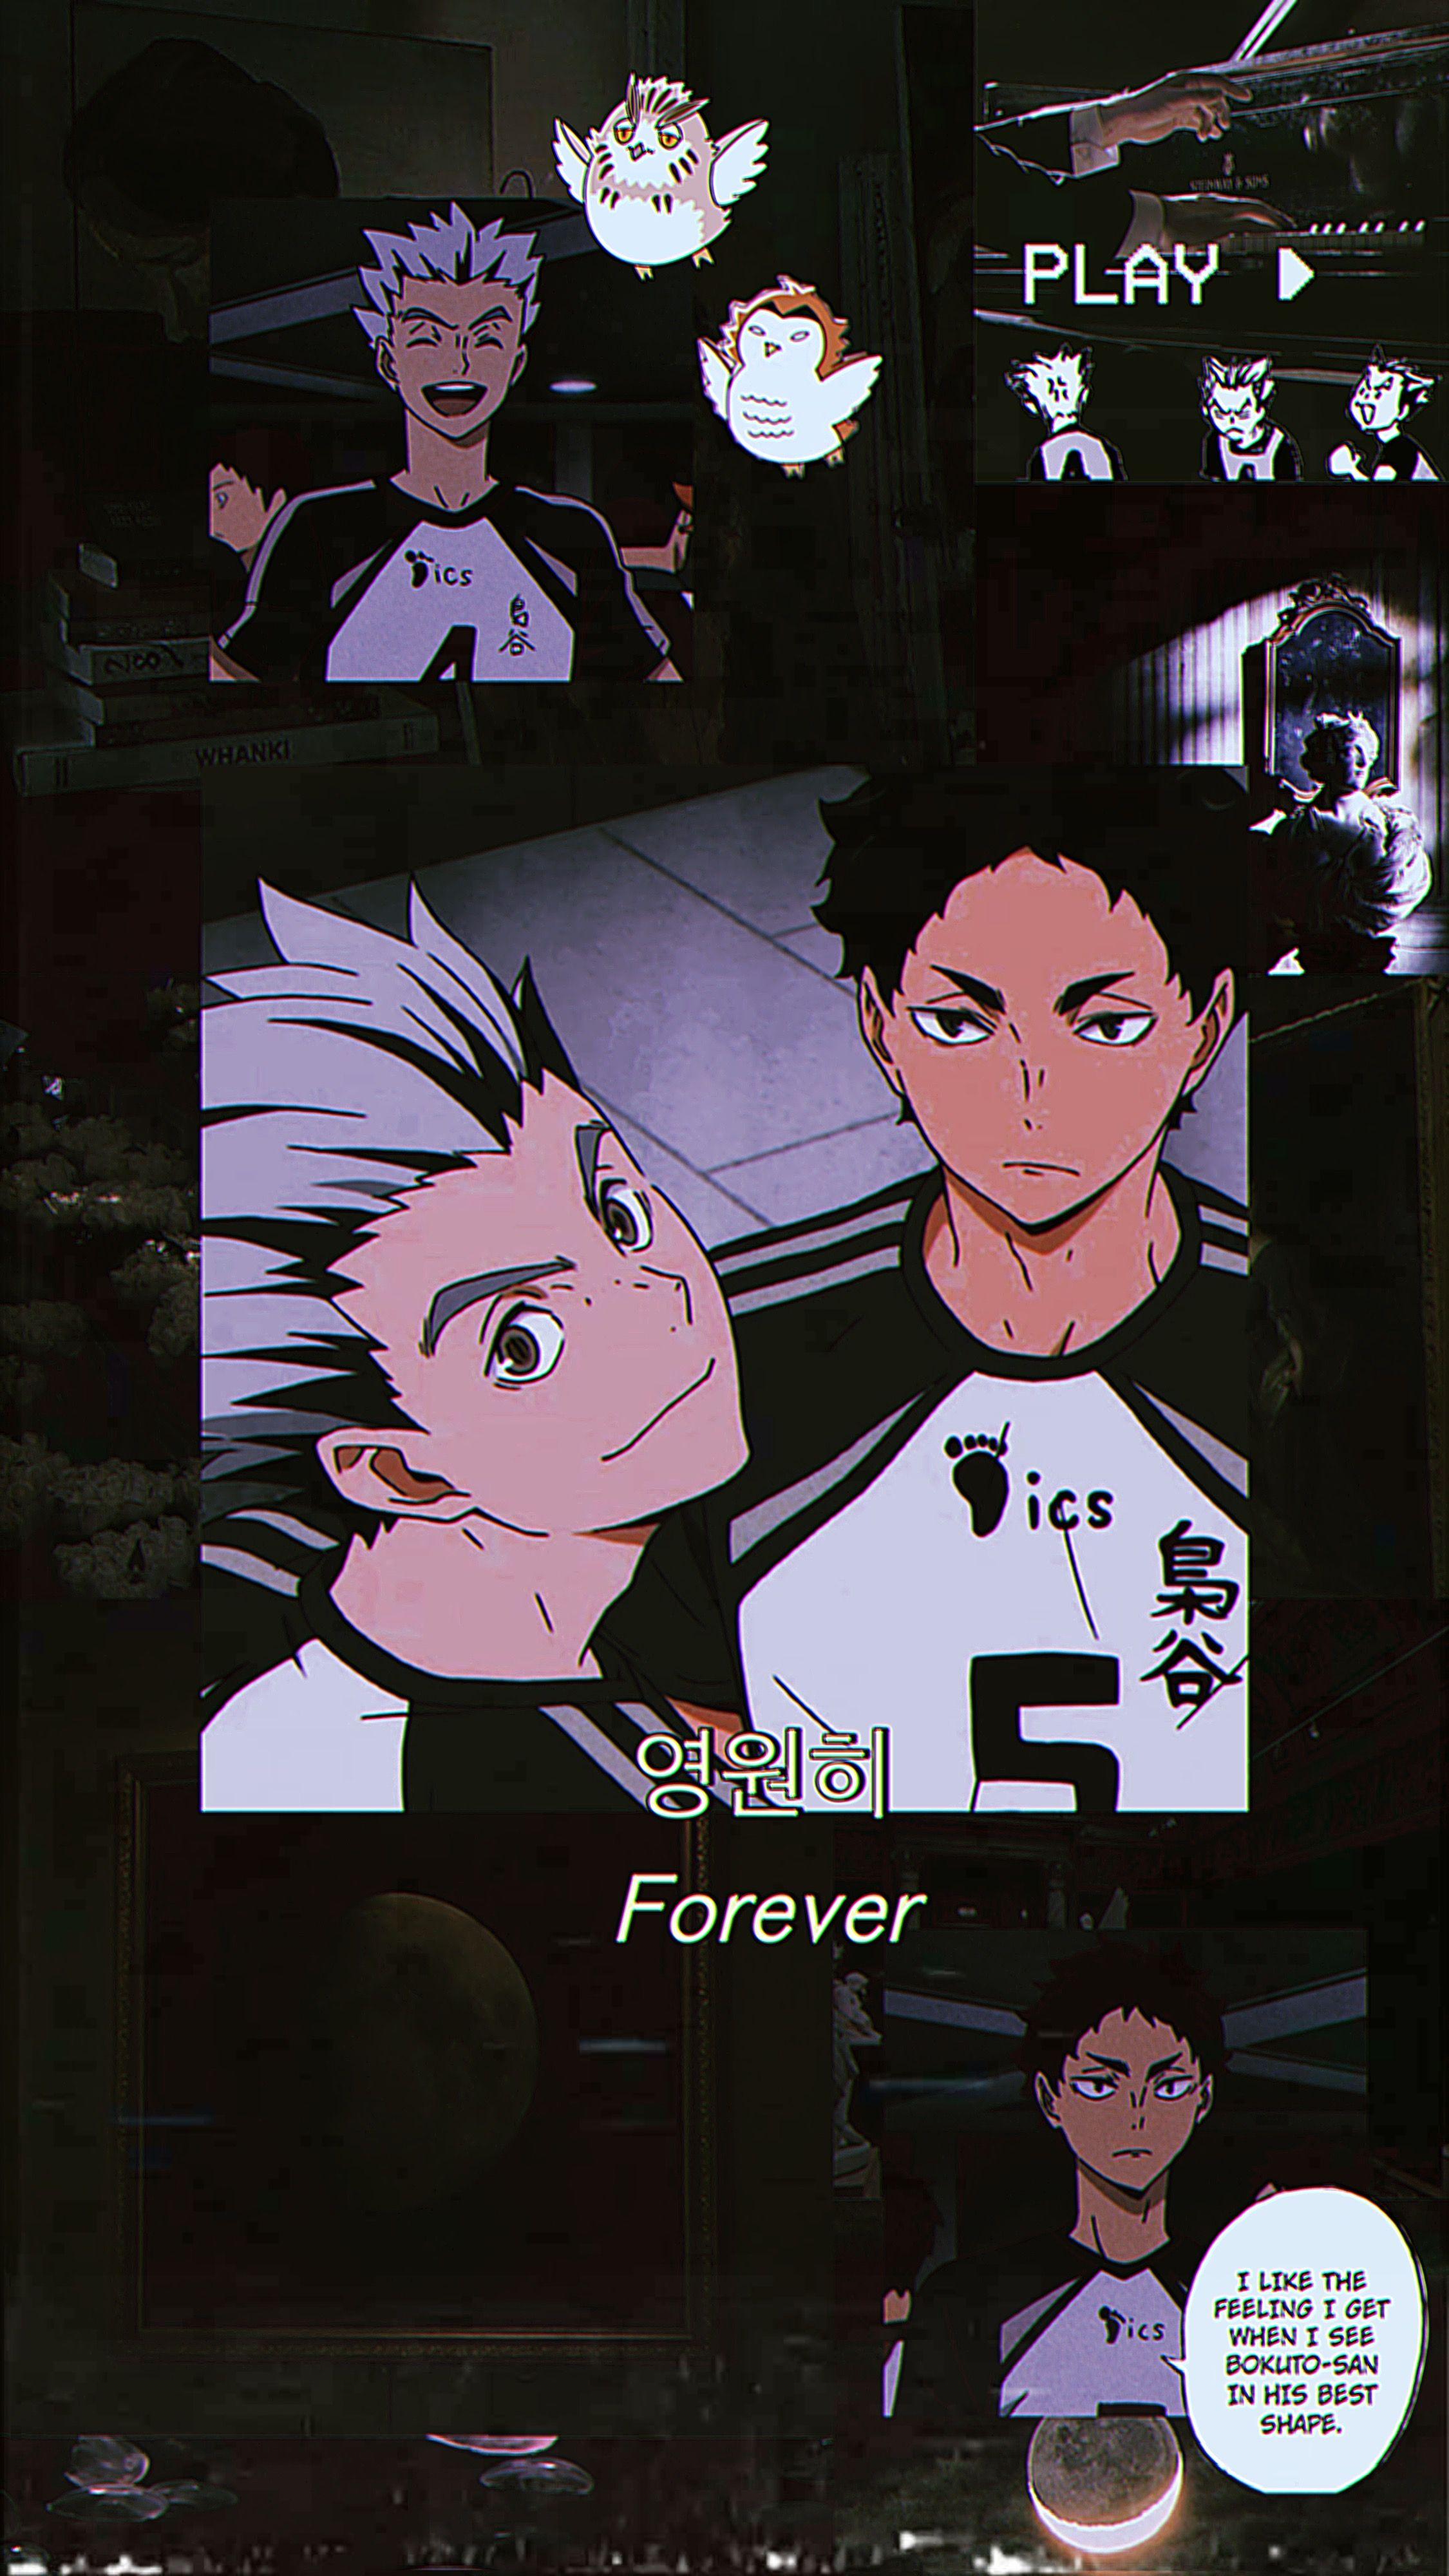 Bokuto Akaashi Wallpaper In 2020 Cute Anime Wallpaper Haikyuu Anime Anime Wallpaper Iphone